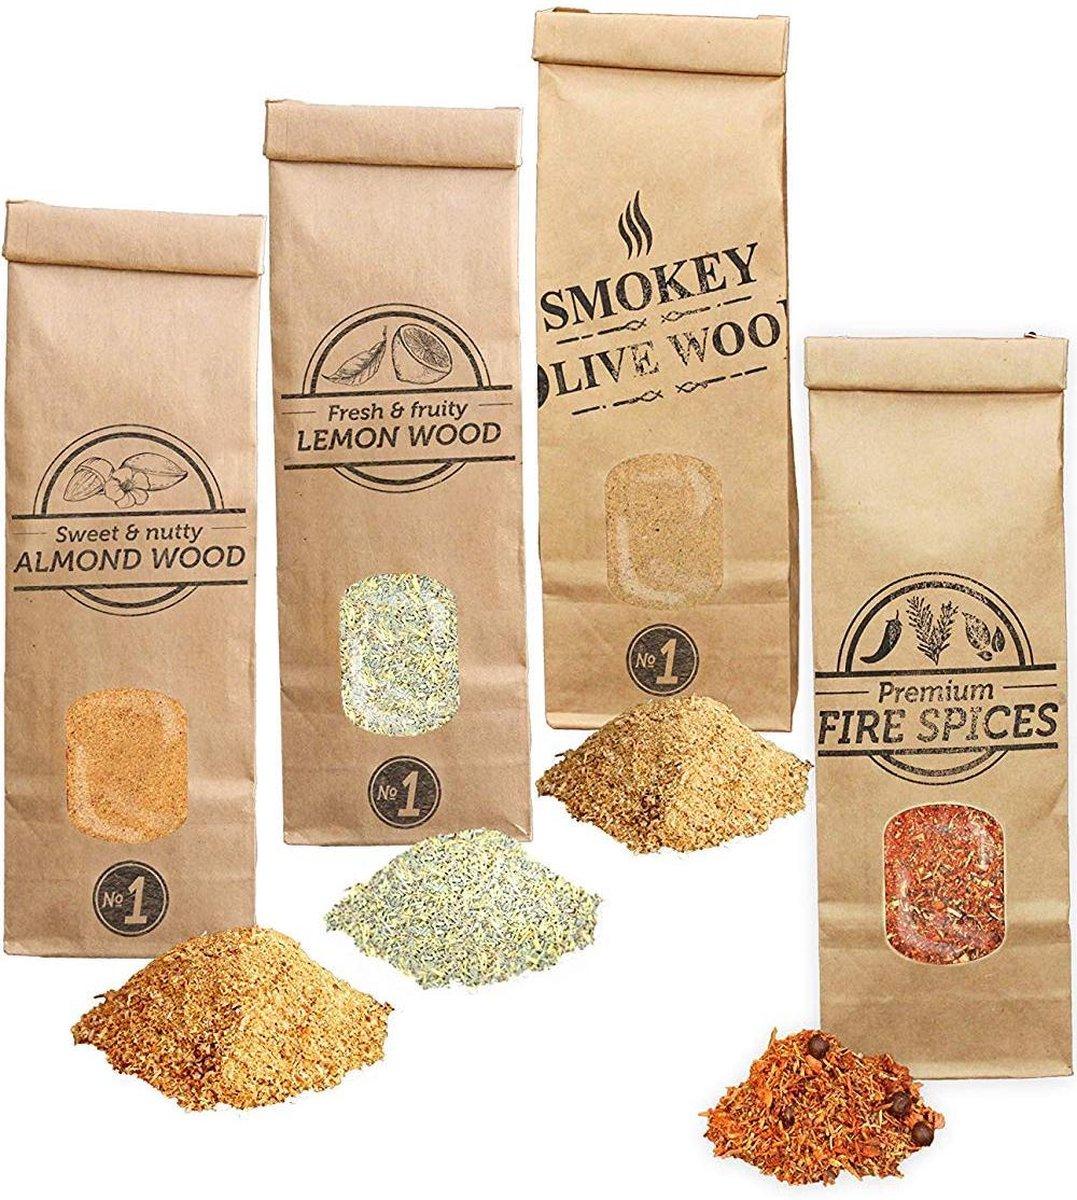 Smokey Olive Wood- 3X 300ml ROOKMOT Selectie + 300ml vuurkruiden, Olijfhout - Amandelhout - Citroenhout - Rookmeel fijn ø 0-1mm